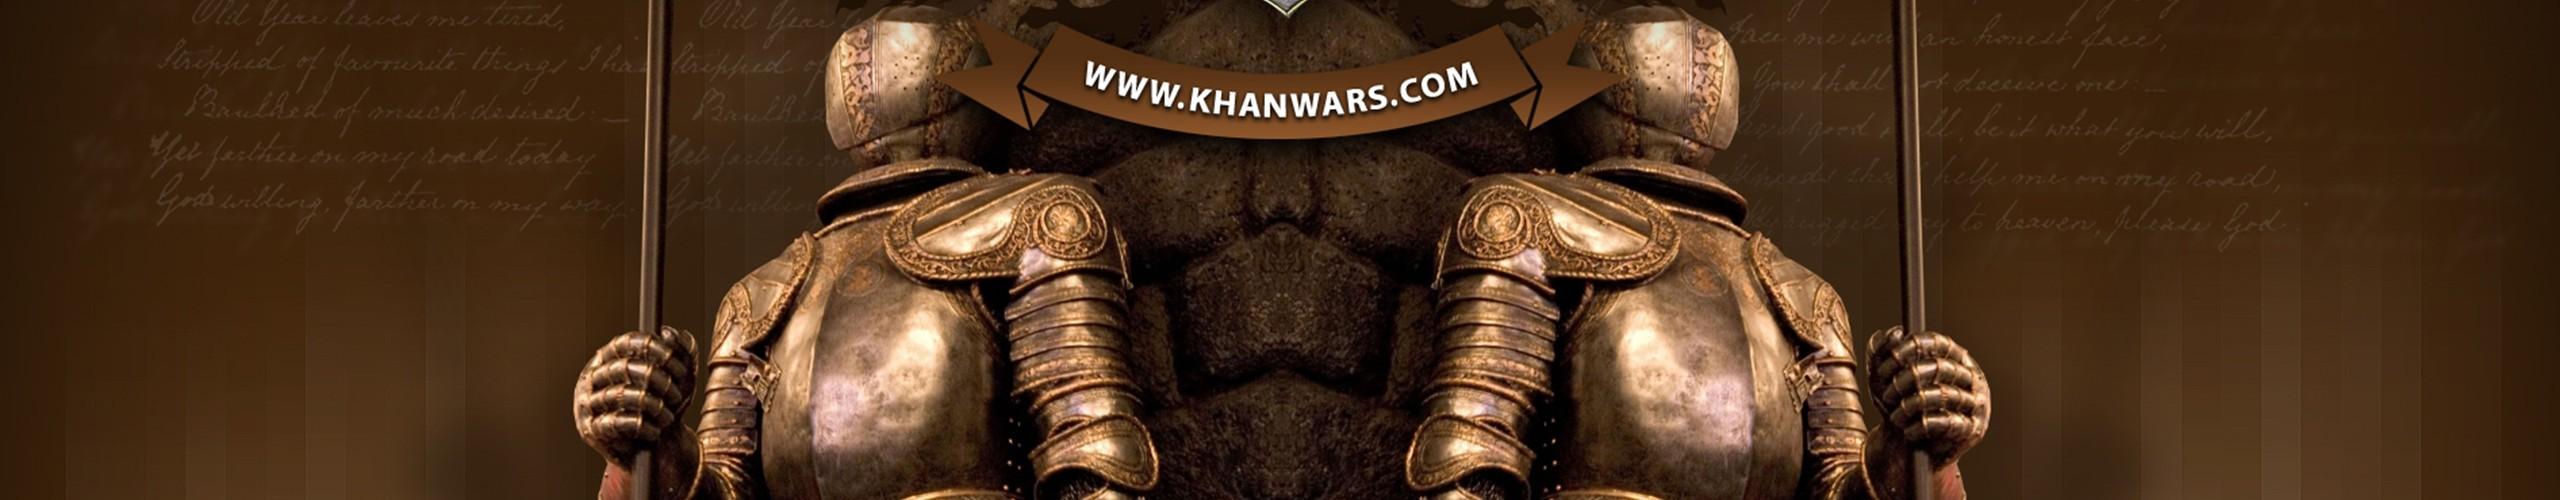 Khan Wars